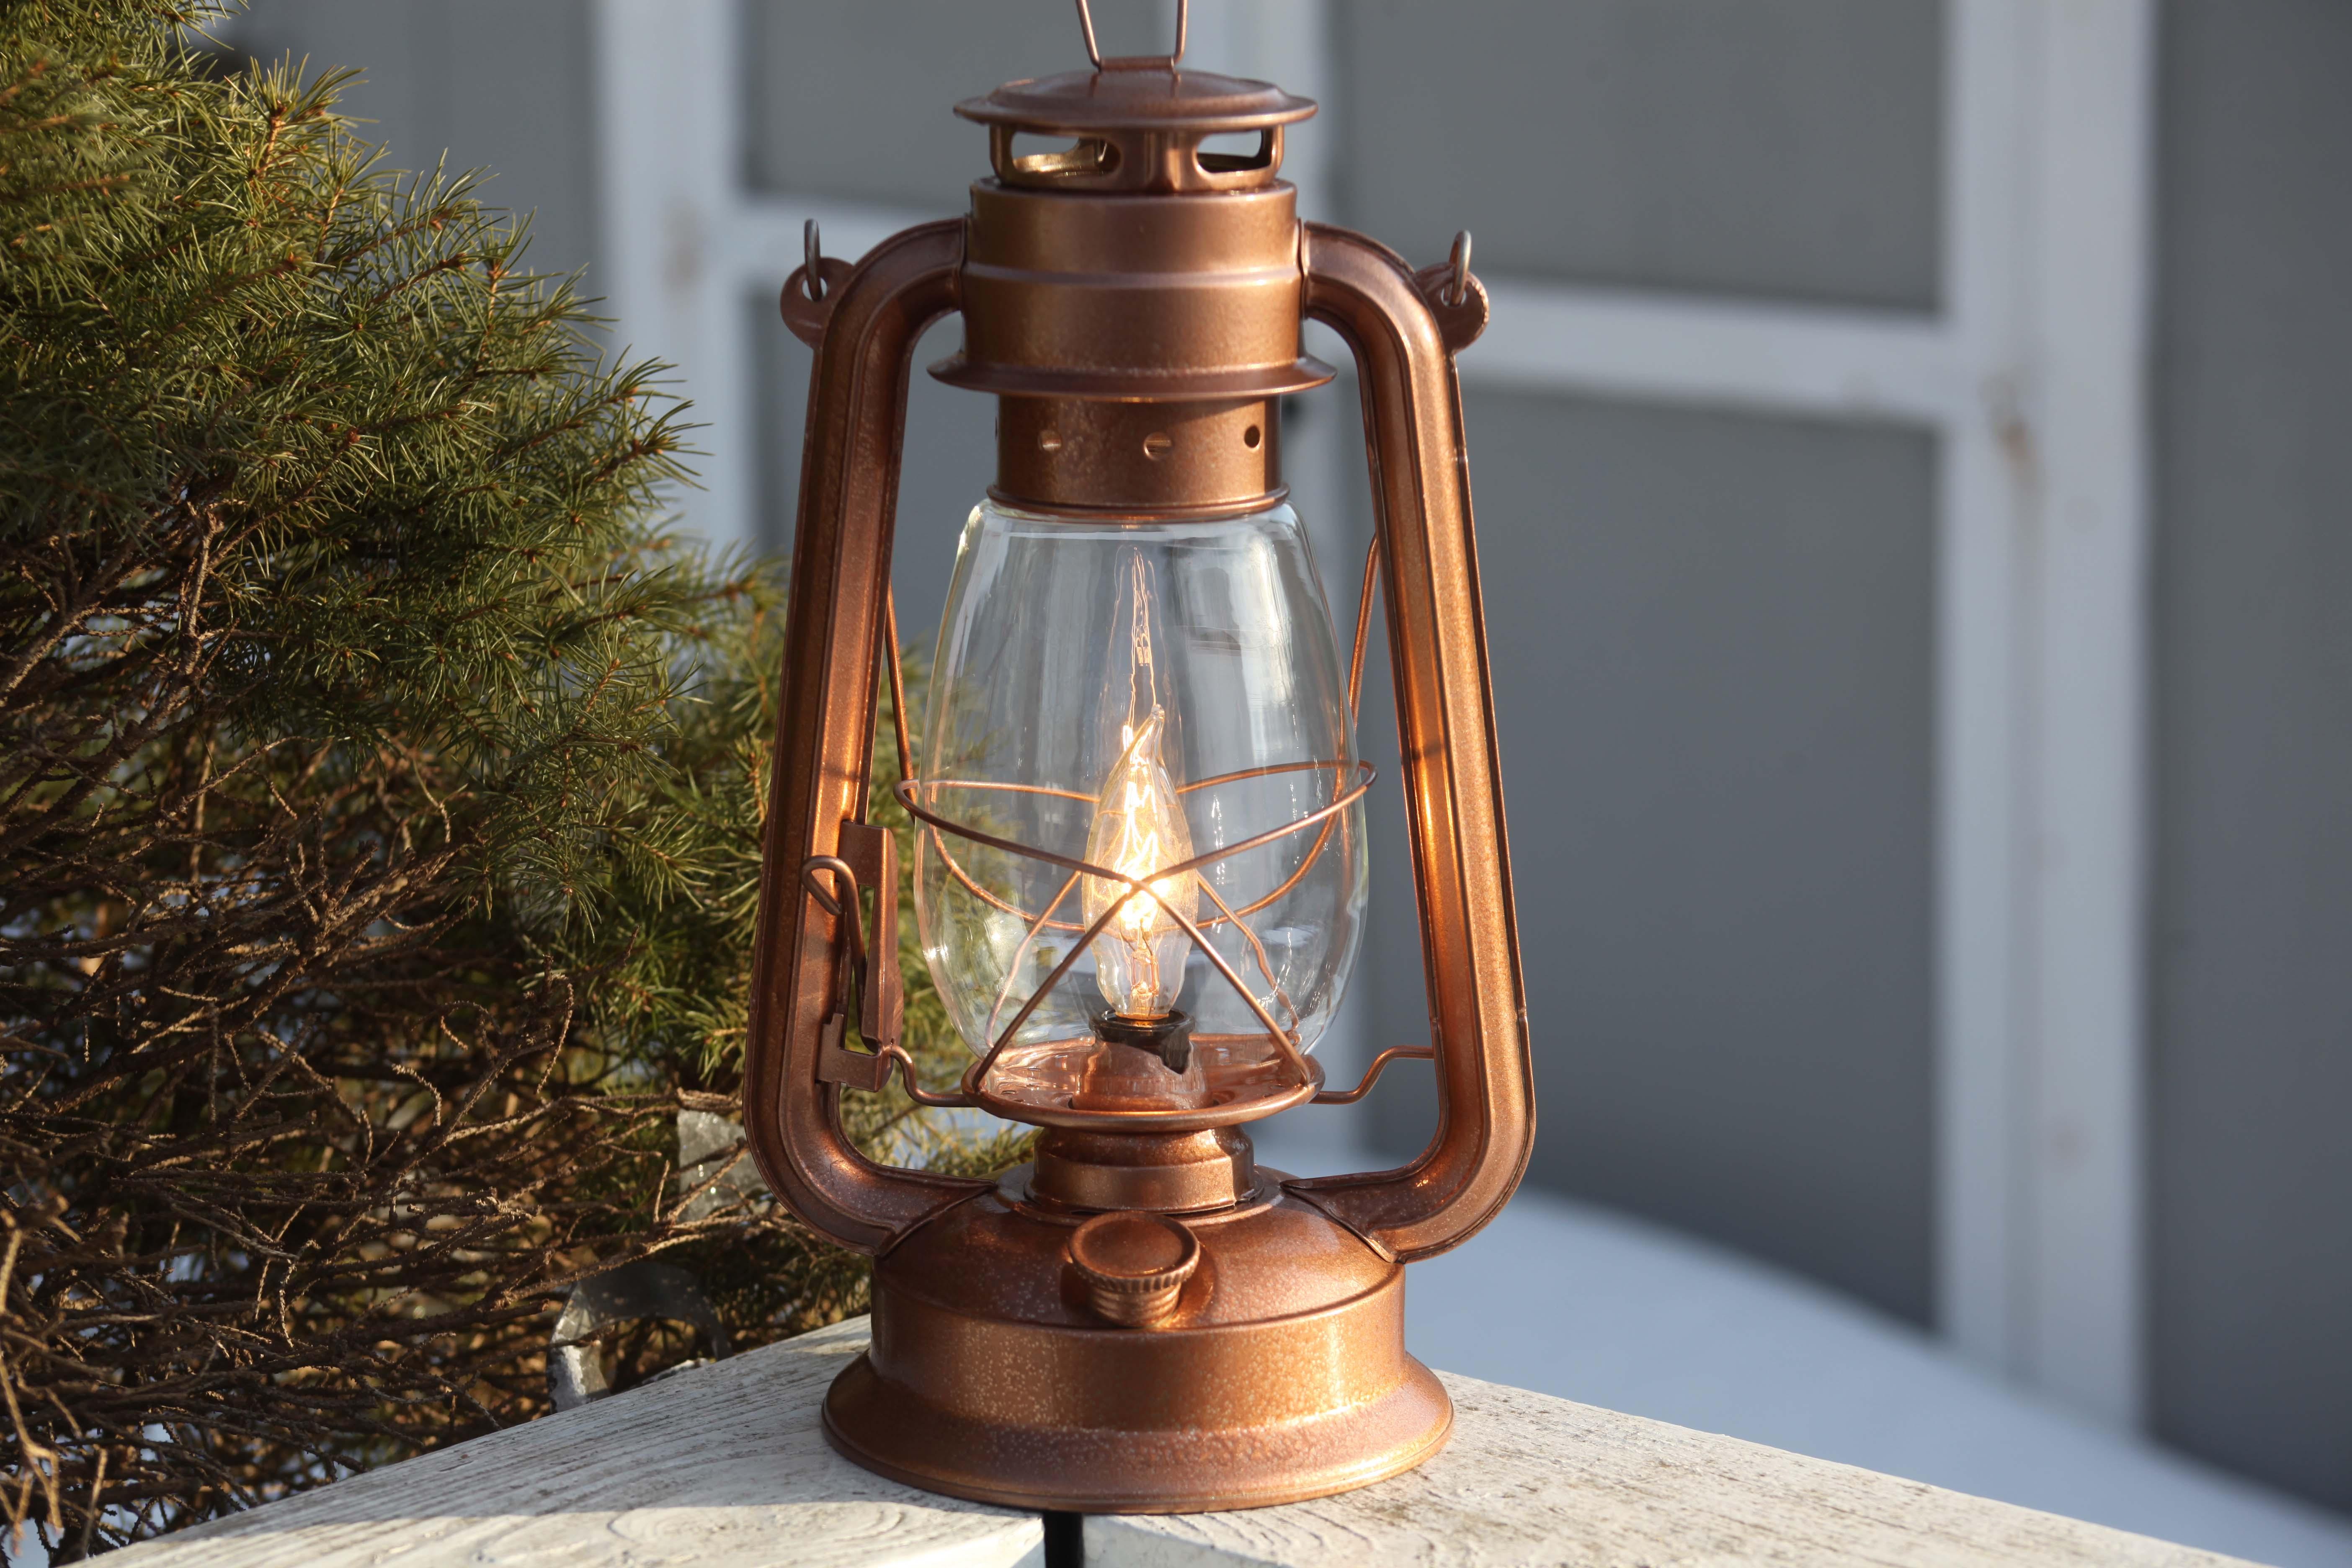 Superior Electric Lantern Table Lamp ...